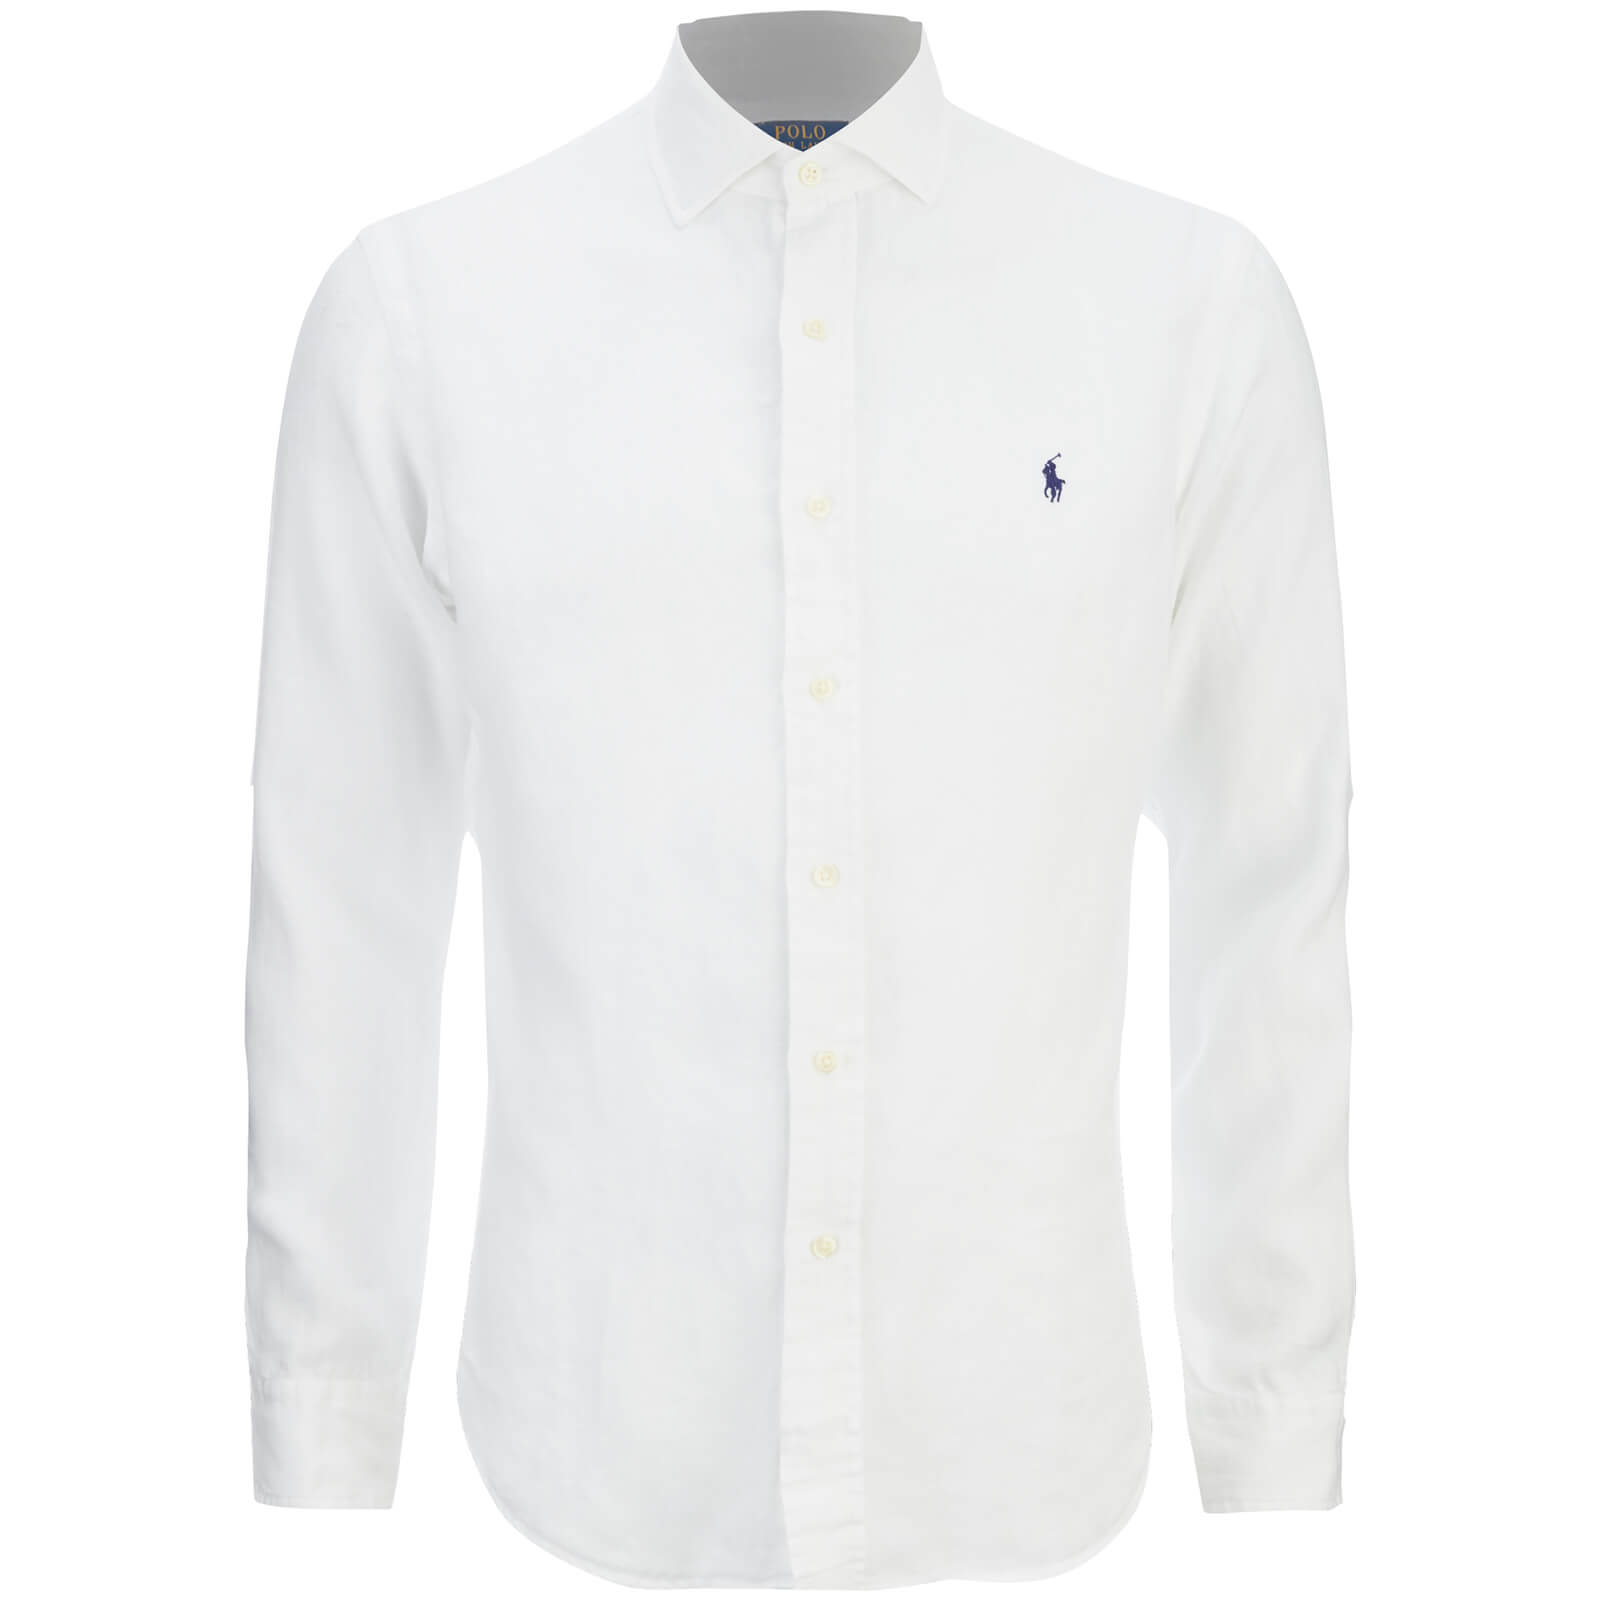 Polo Ralph Lauren Men\u0027s Slim Fit Long Sleeve Linen Shirt - White - Free UK  Delivery over �50